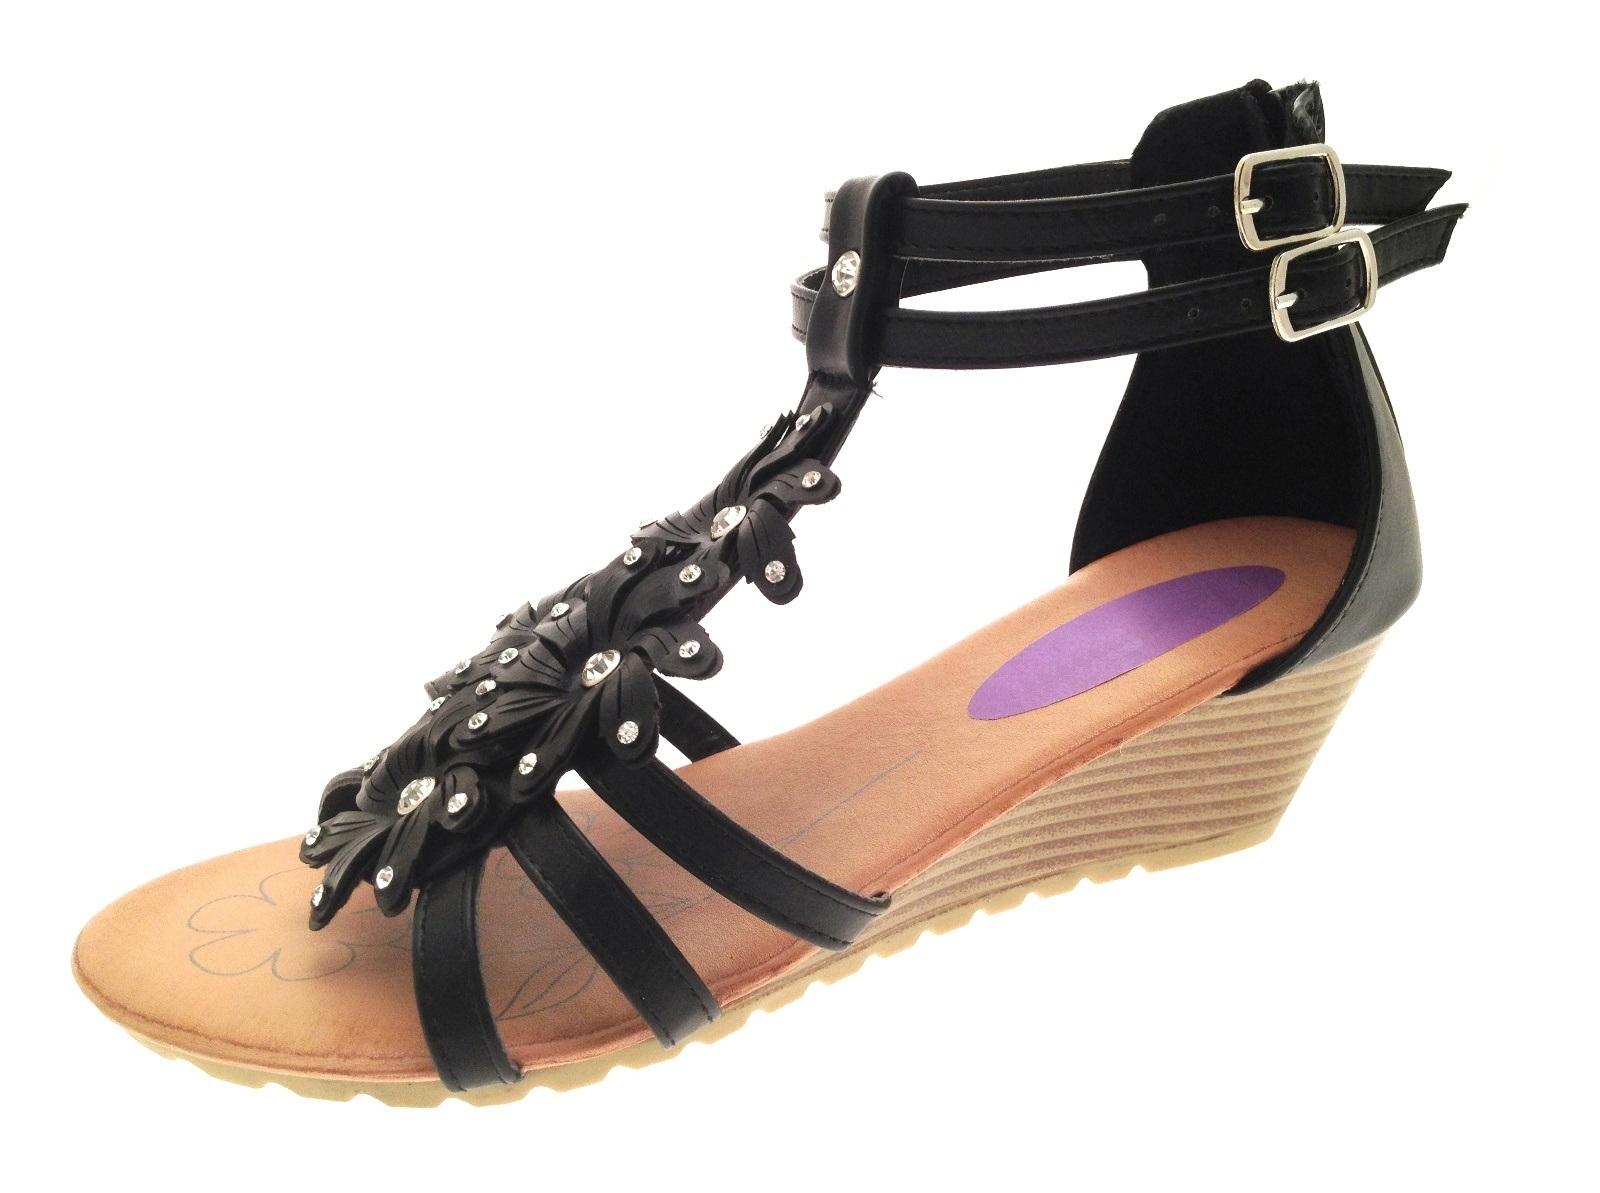 Black sandals ebay uk - Womens Diamante Flower T Bar Summer Sandals Low Wedges Heels Shoes Size Uk 3 8